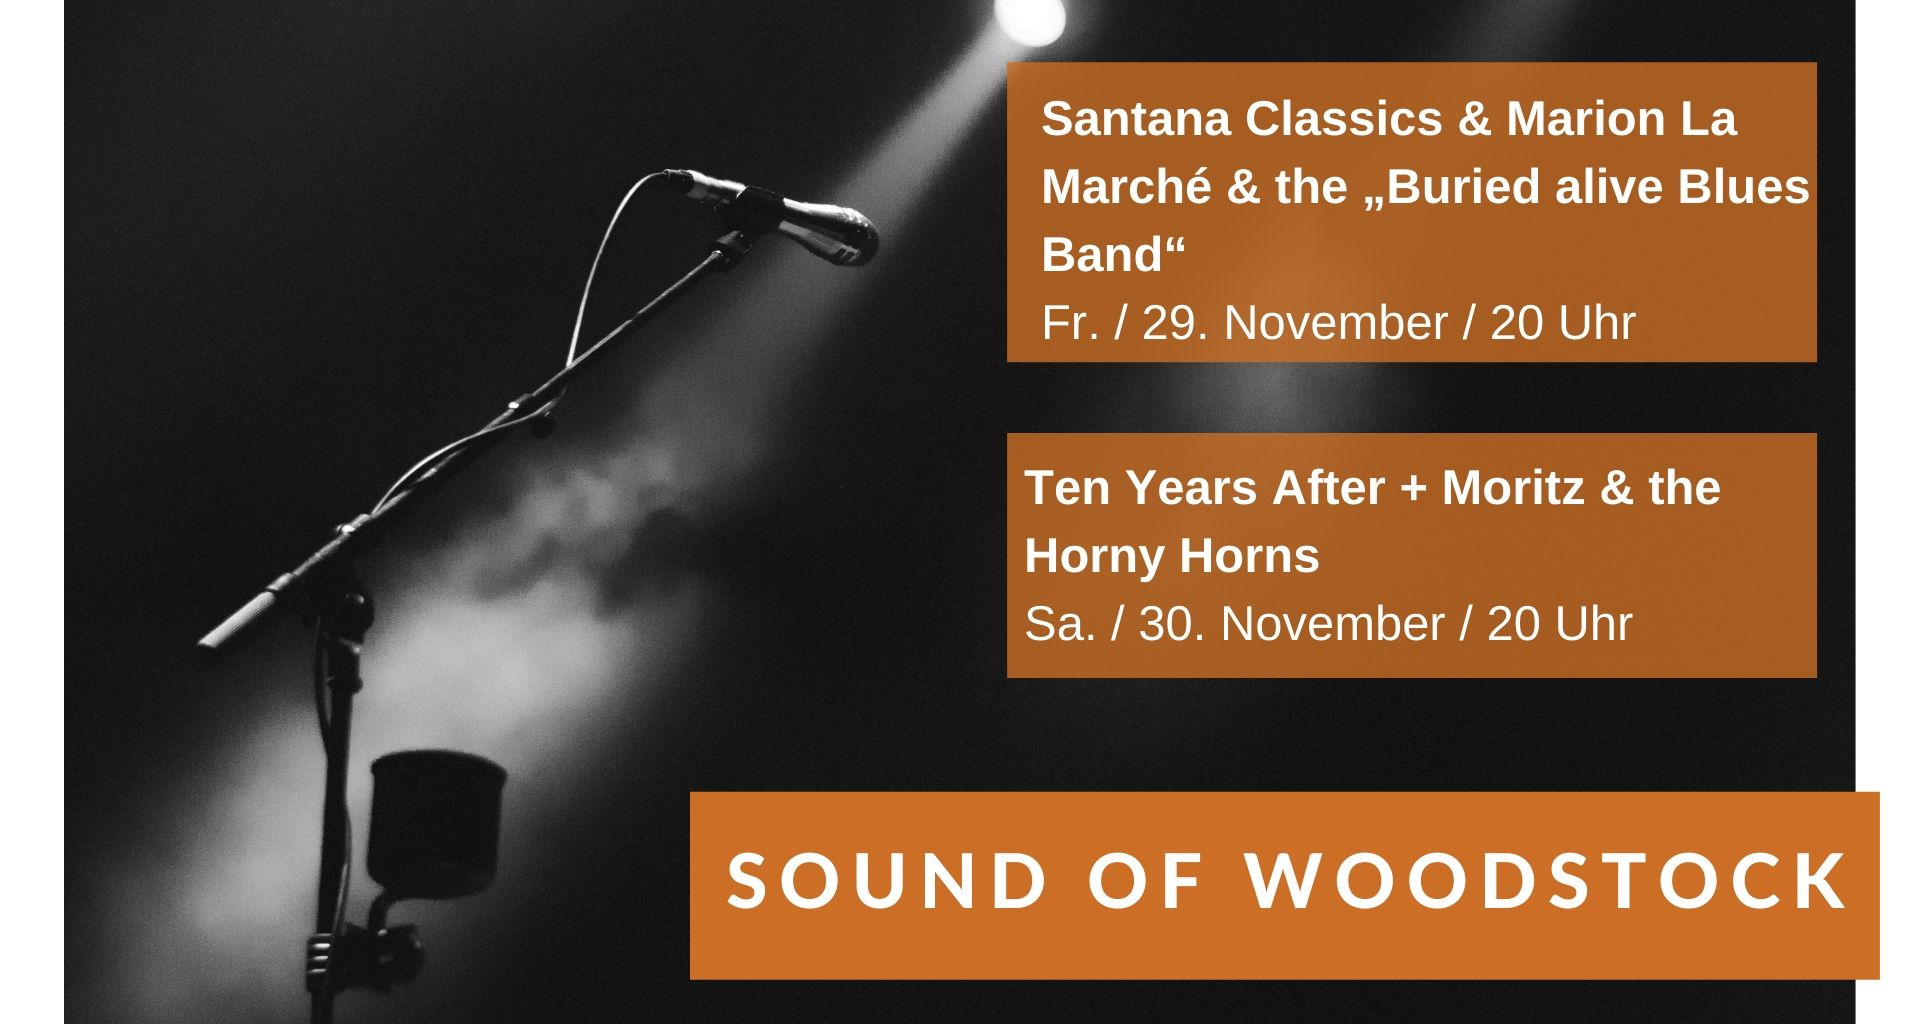 Top Event - Sound of Woodstock